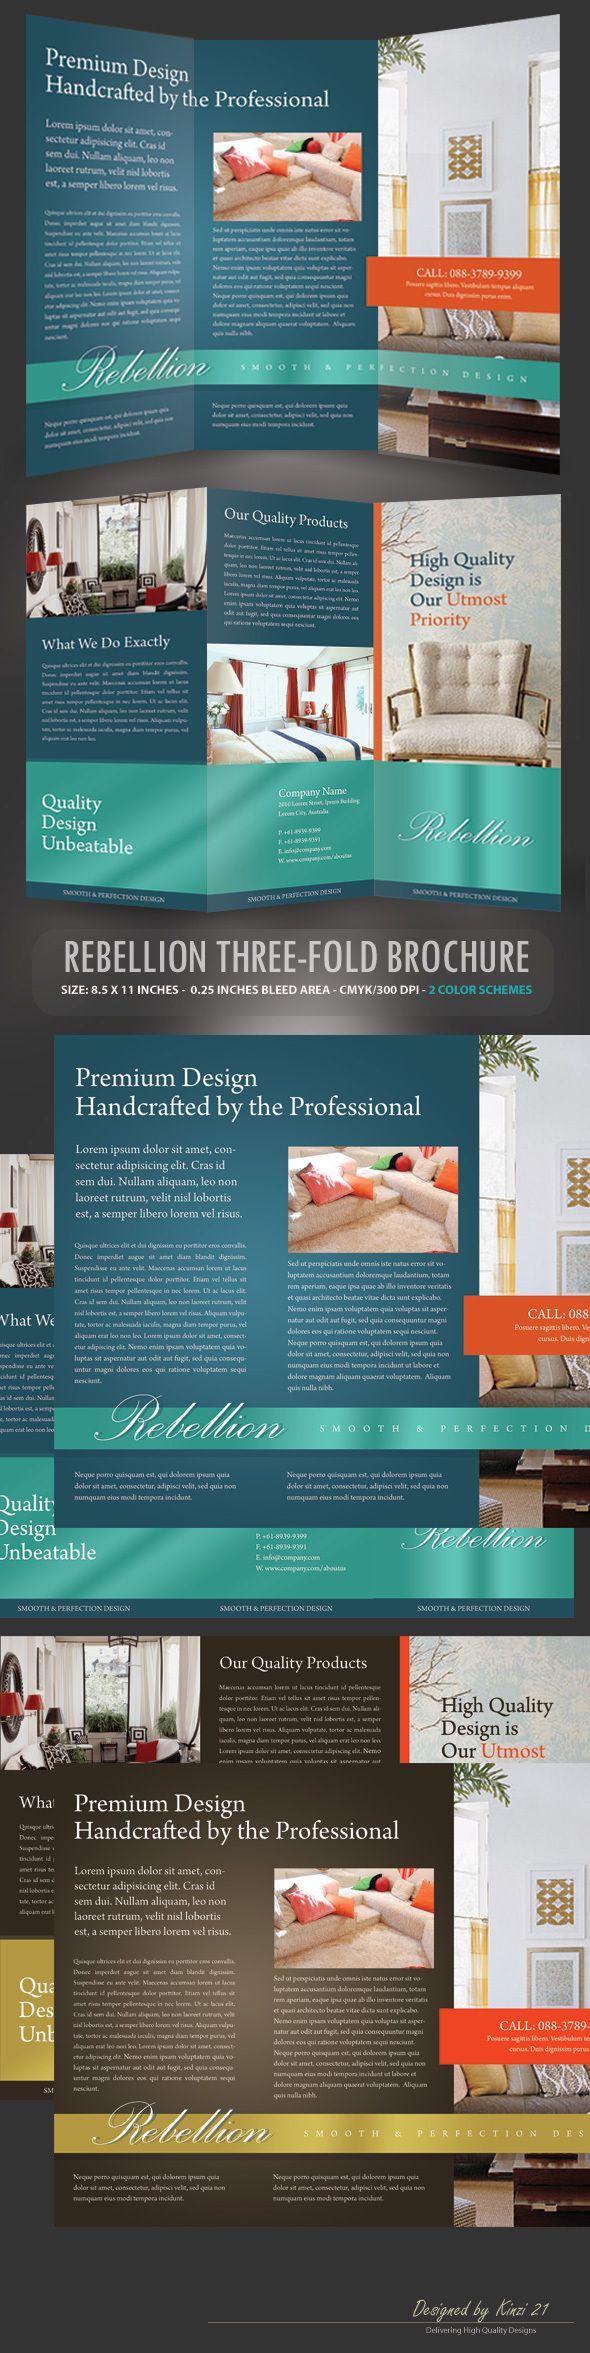 Rebellion Trifold Brochure Template on Behance